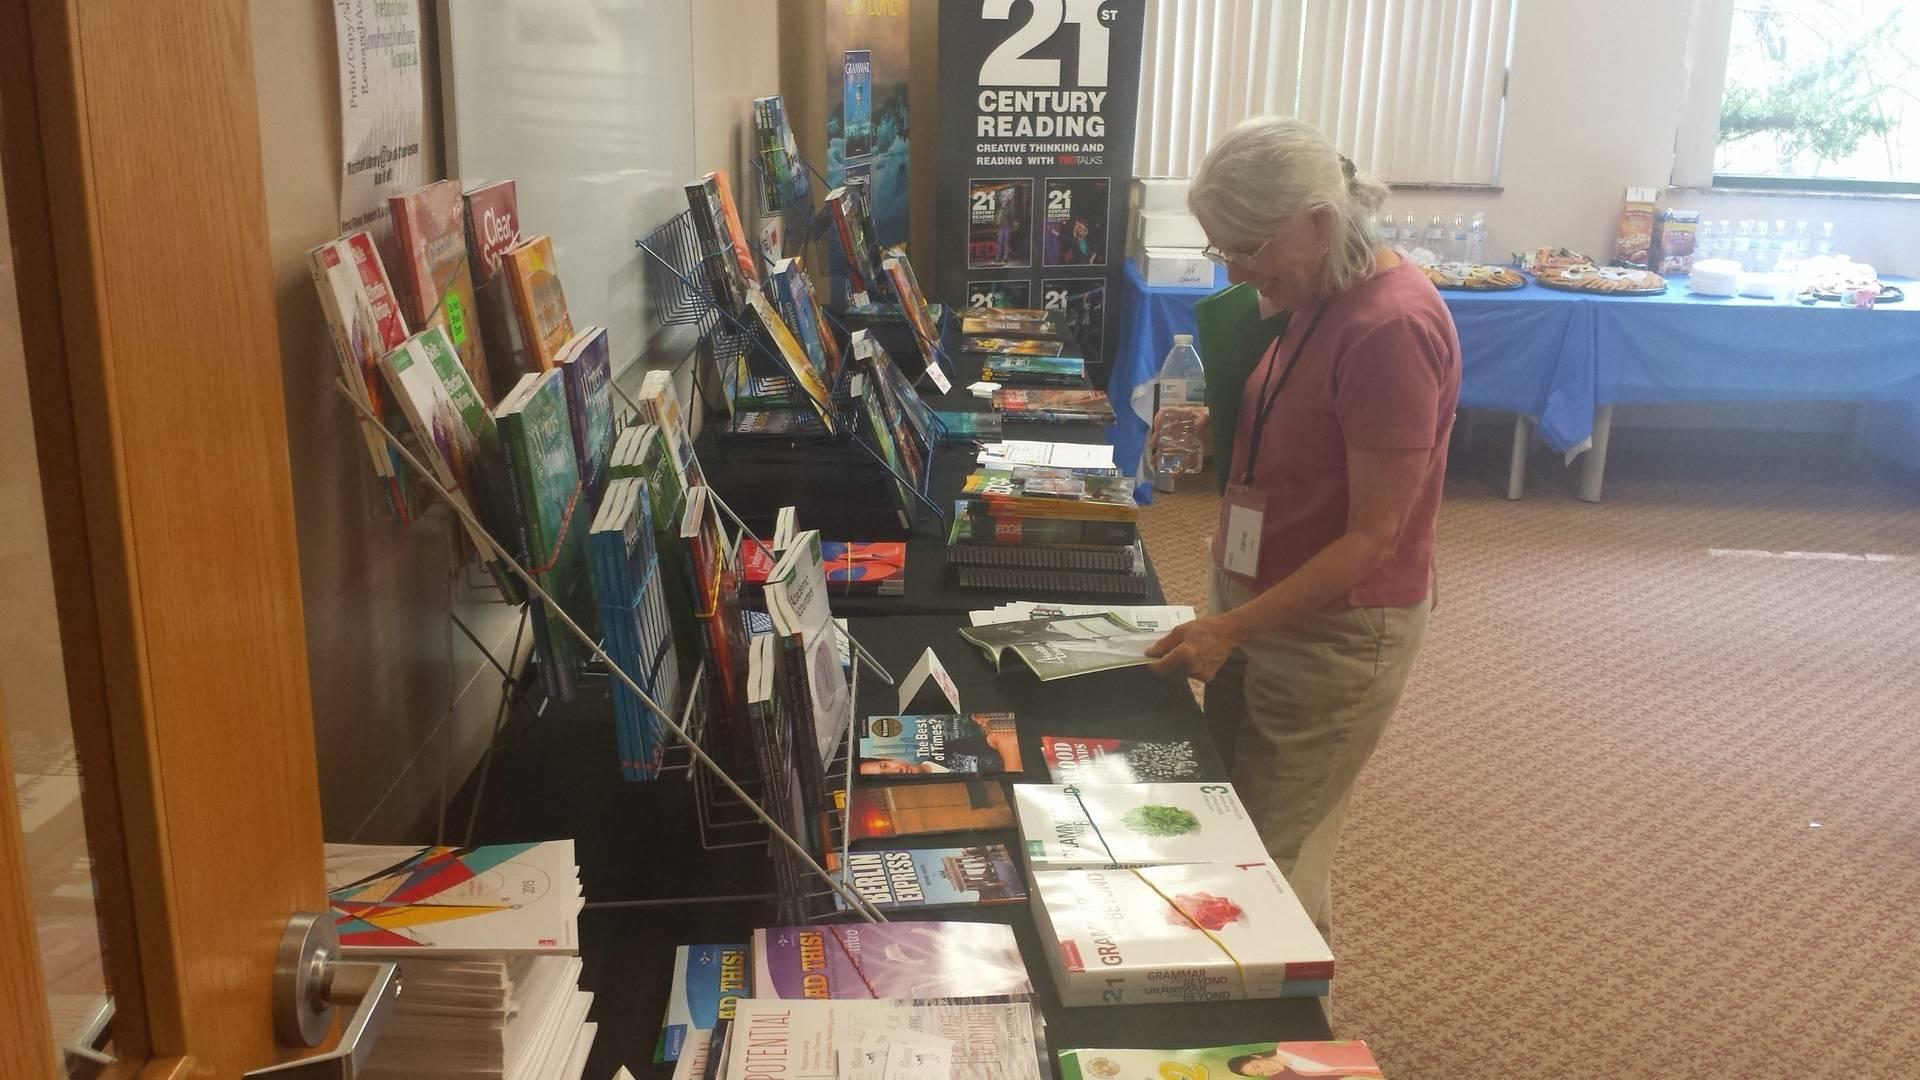 Publisher displays